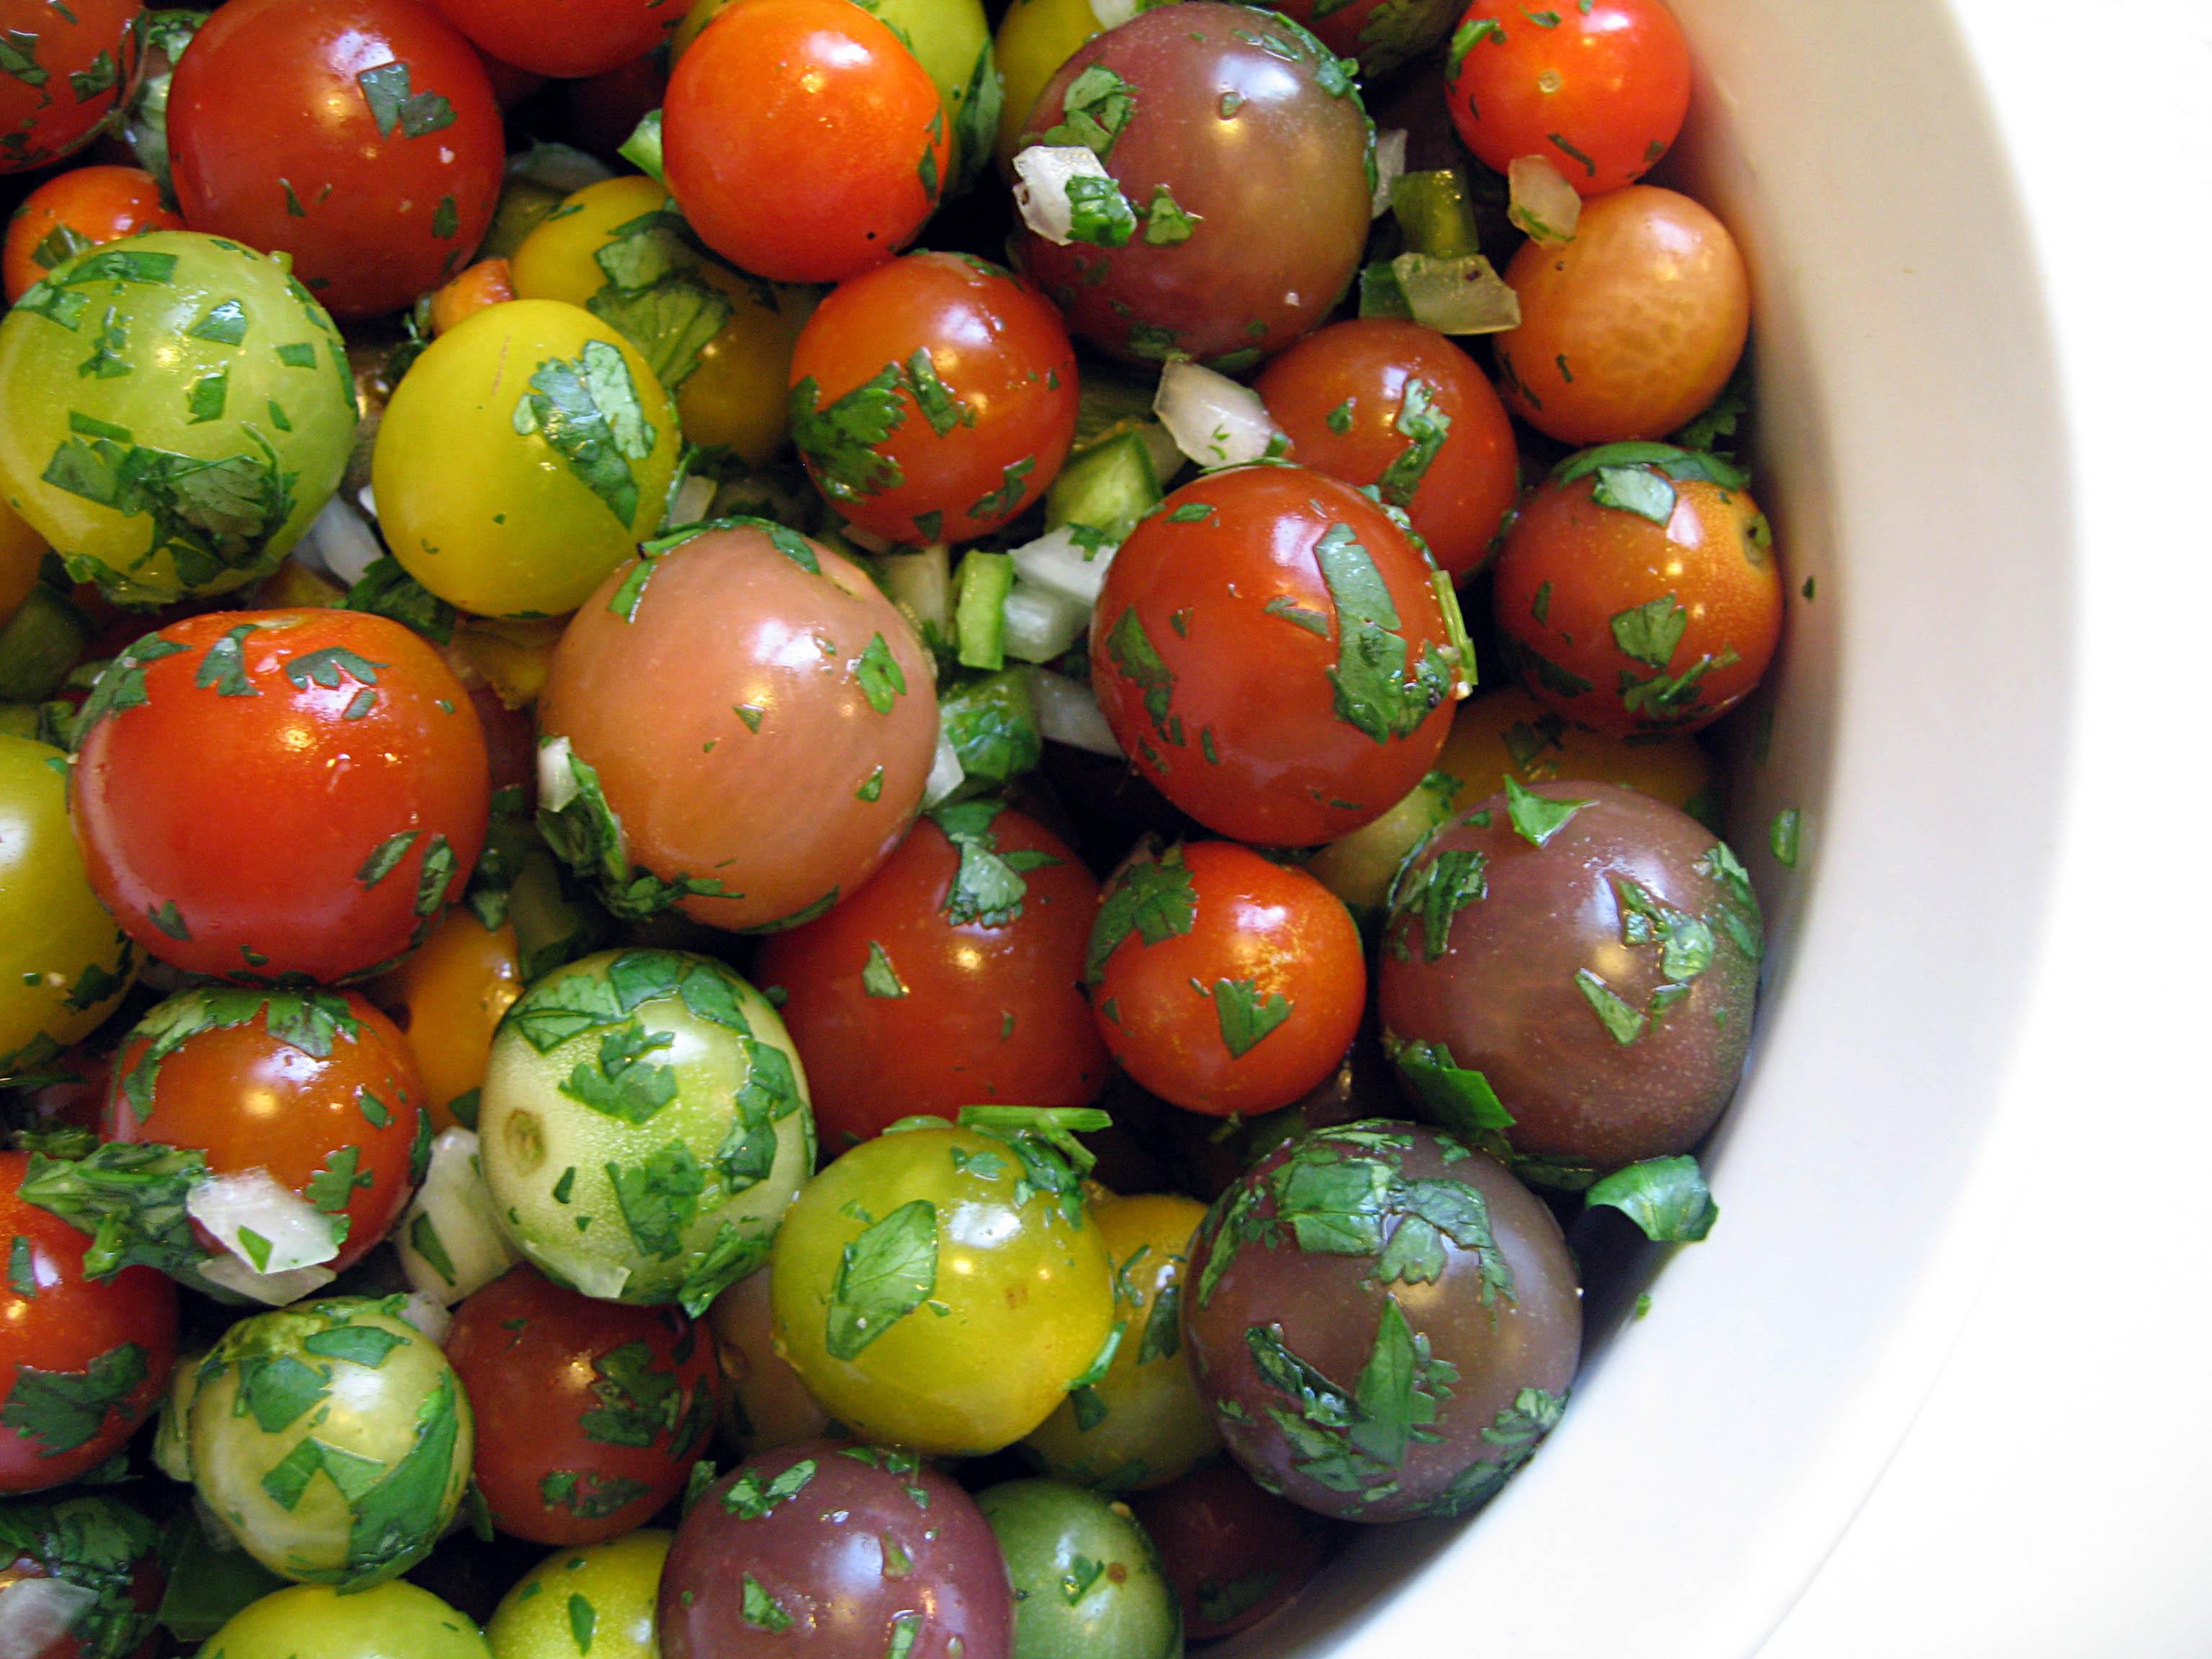 Heirloom Tomato Pico de Gallo Salad | Our Life in Food